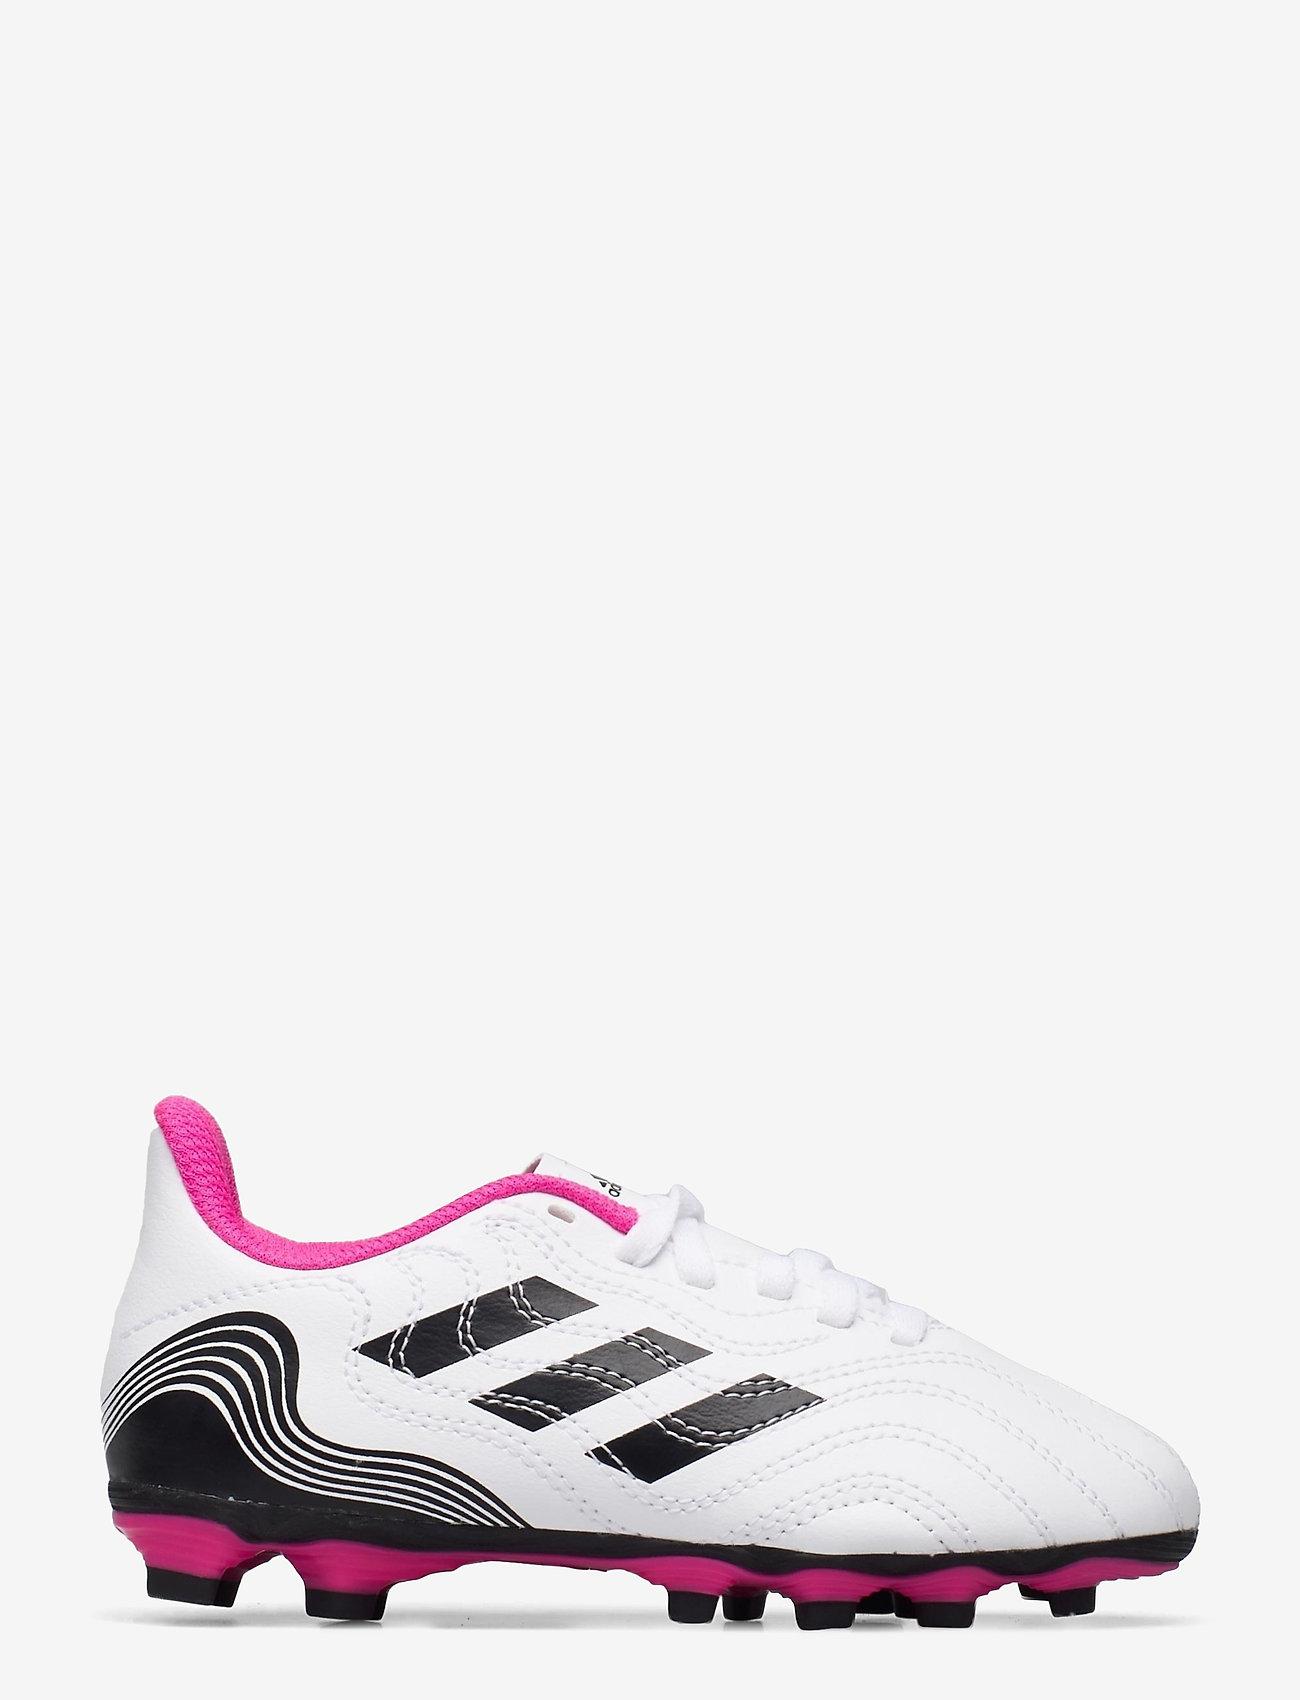 Copa Sense.4 Flexible Ground Boots